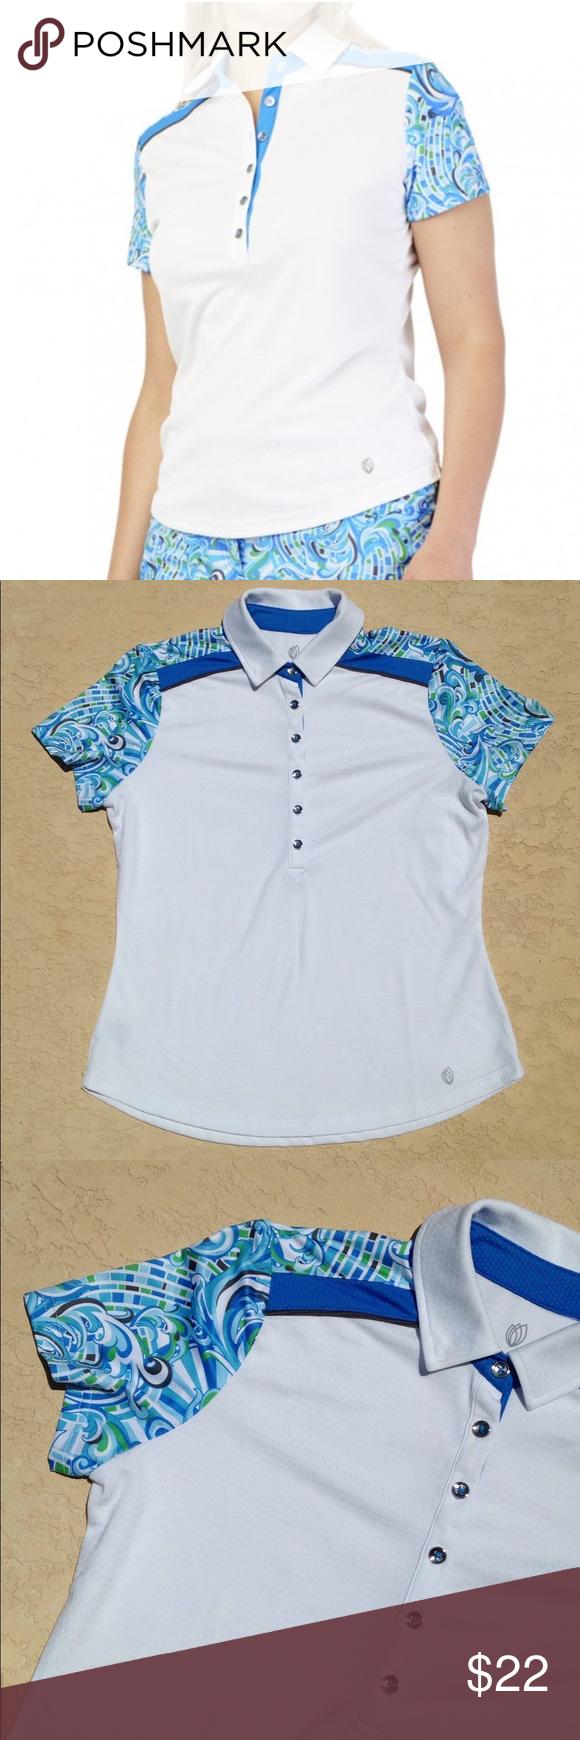 Gg Blue Golf Shirt Nwt Golf Shirts Shirts Fashion